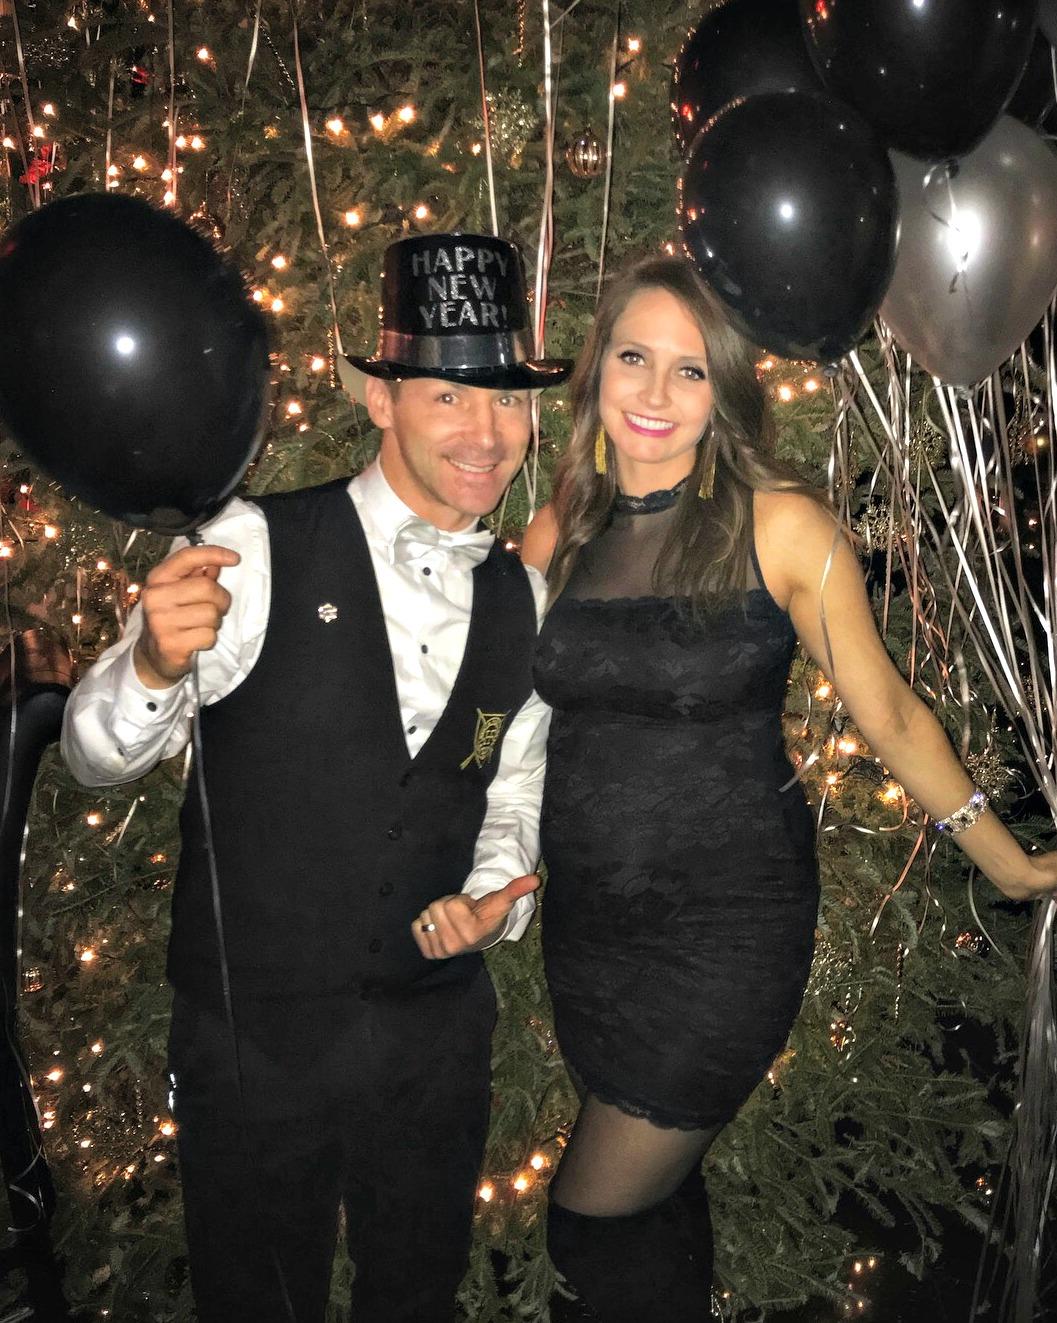 scott and heather new years eve 2018